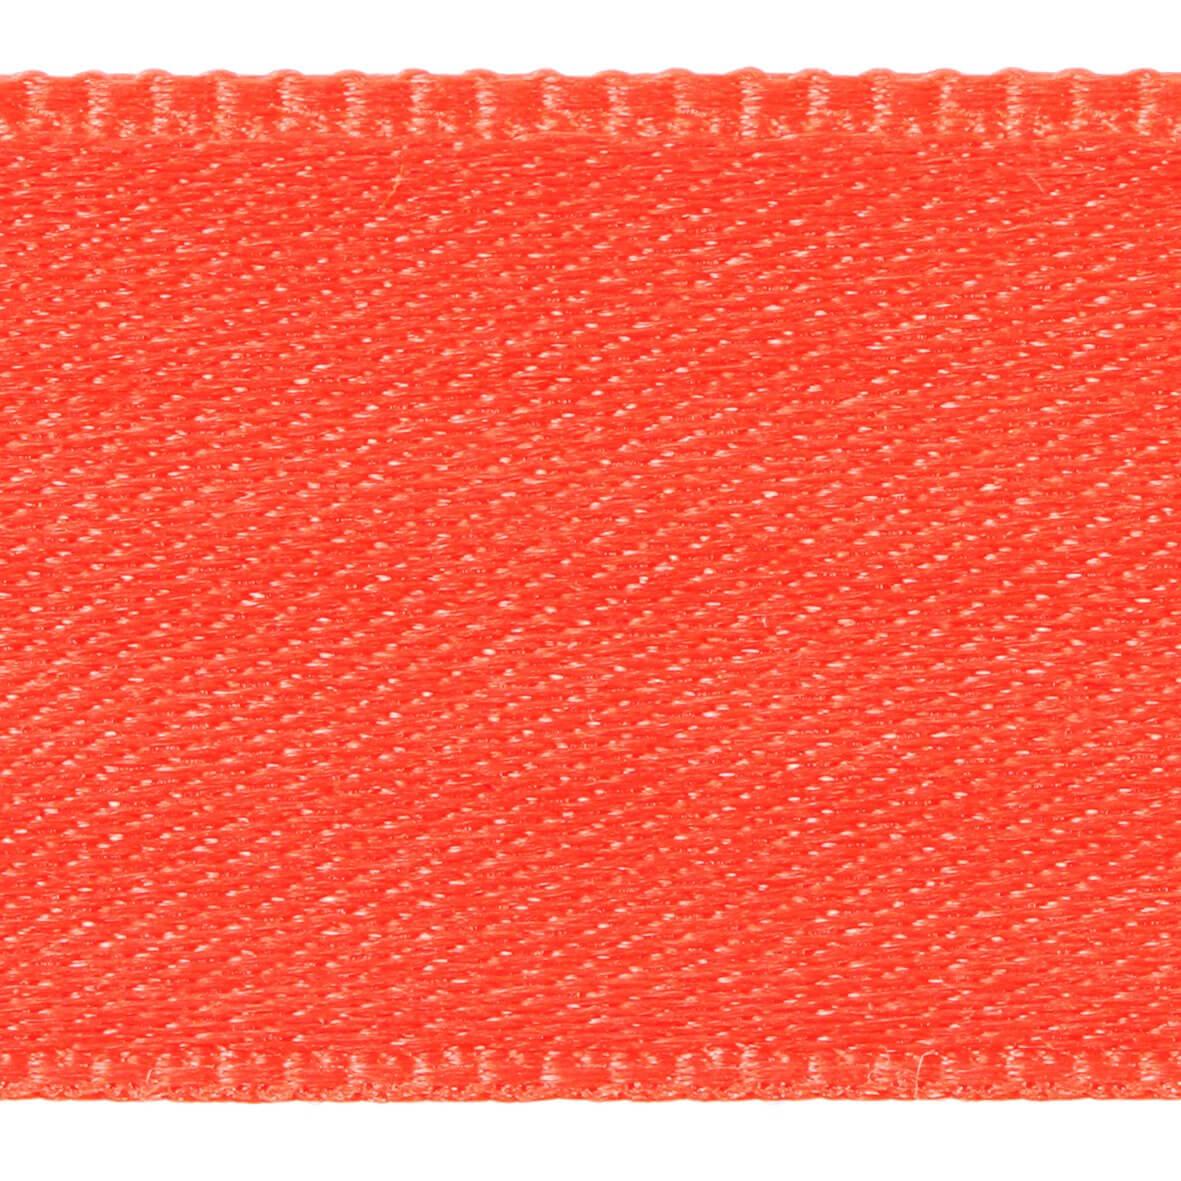 Coraline Col. 293 - 25mm Satab Satin Ribbon